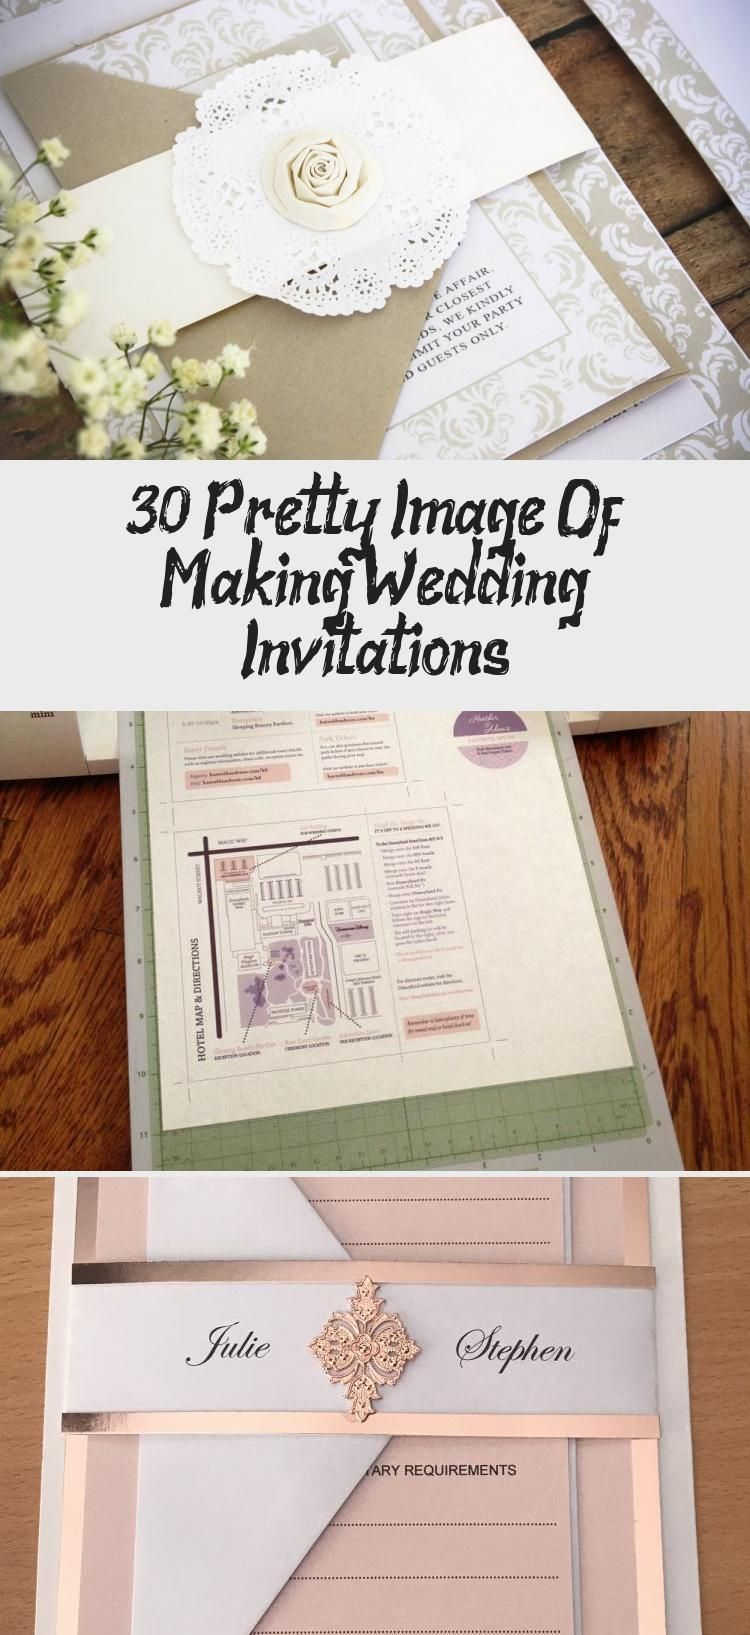 30 Pretty Image Of Making Wedding Invitations Wedding 30 Pretty Image Of Mak Making Wedding Invitations Addressing Wedding Invitations Wedding Invitations